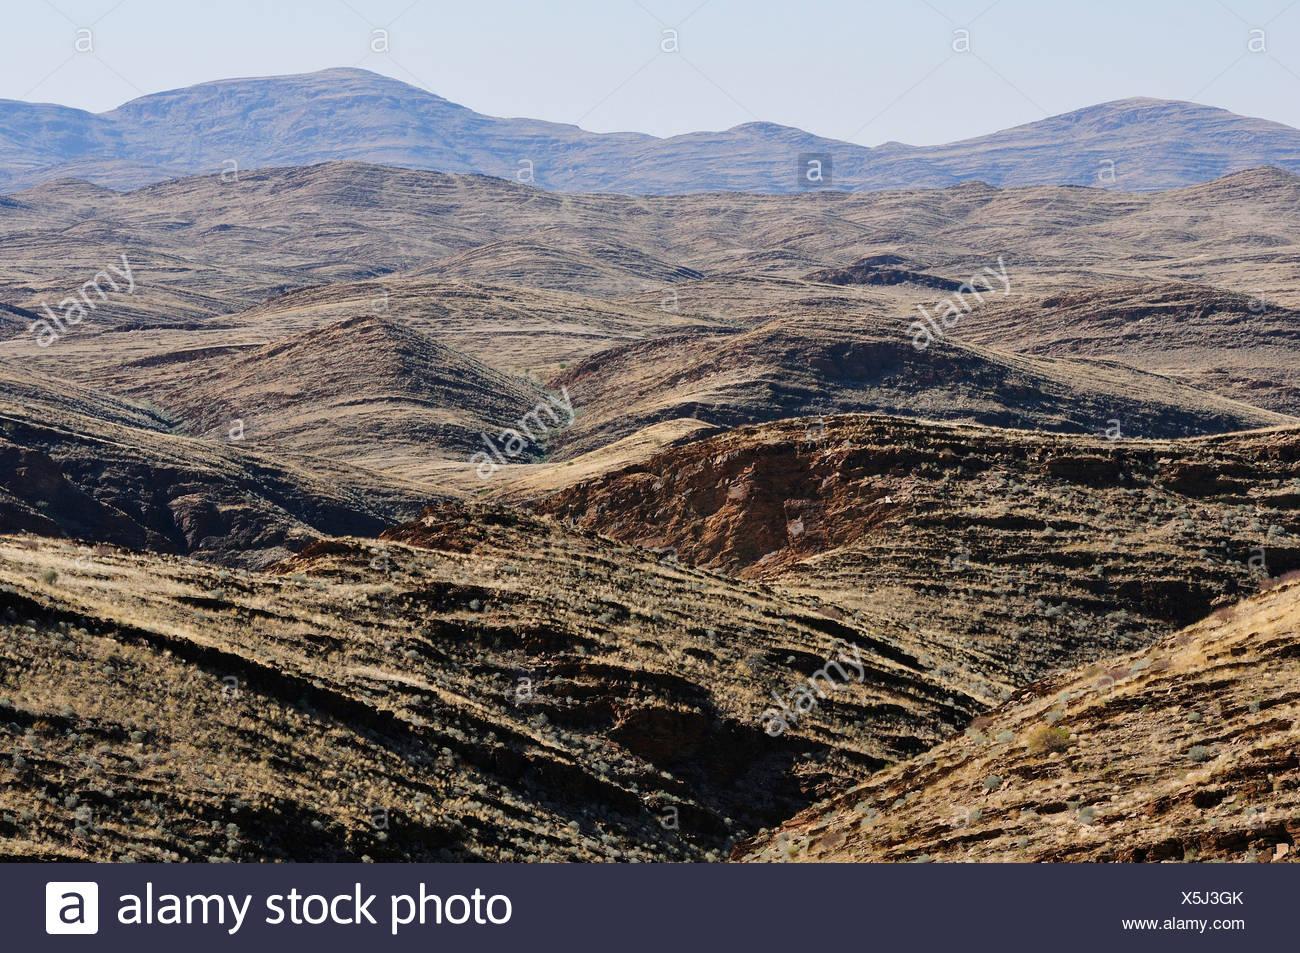 Africa, Namib, Naukluft, Park, Namibia, desert, fold, geology, horizontal, landscape, monochromatic, rolling hills, hills - Stock Image